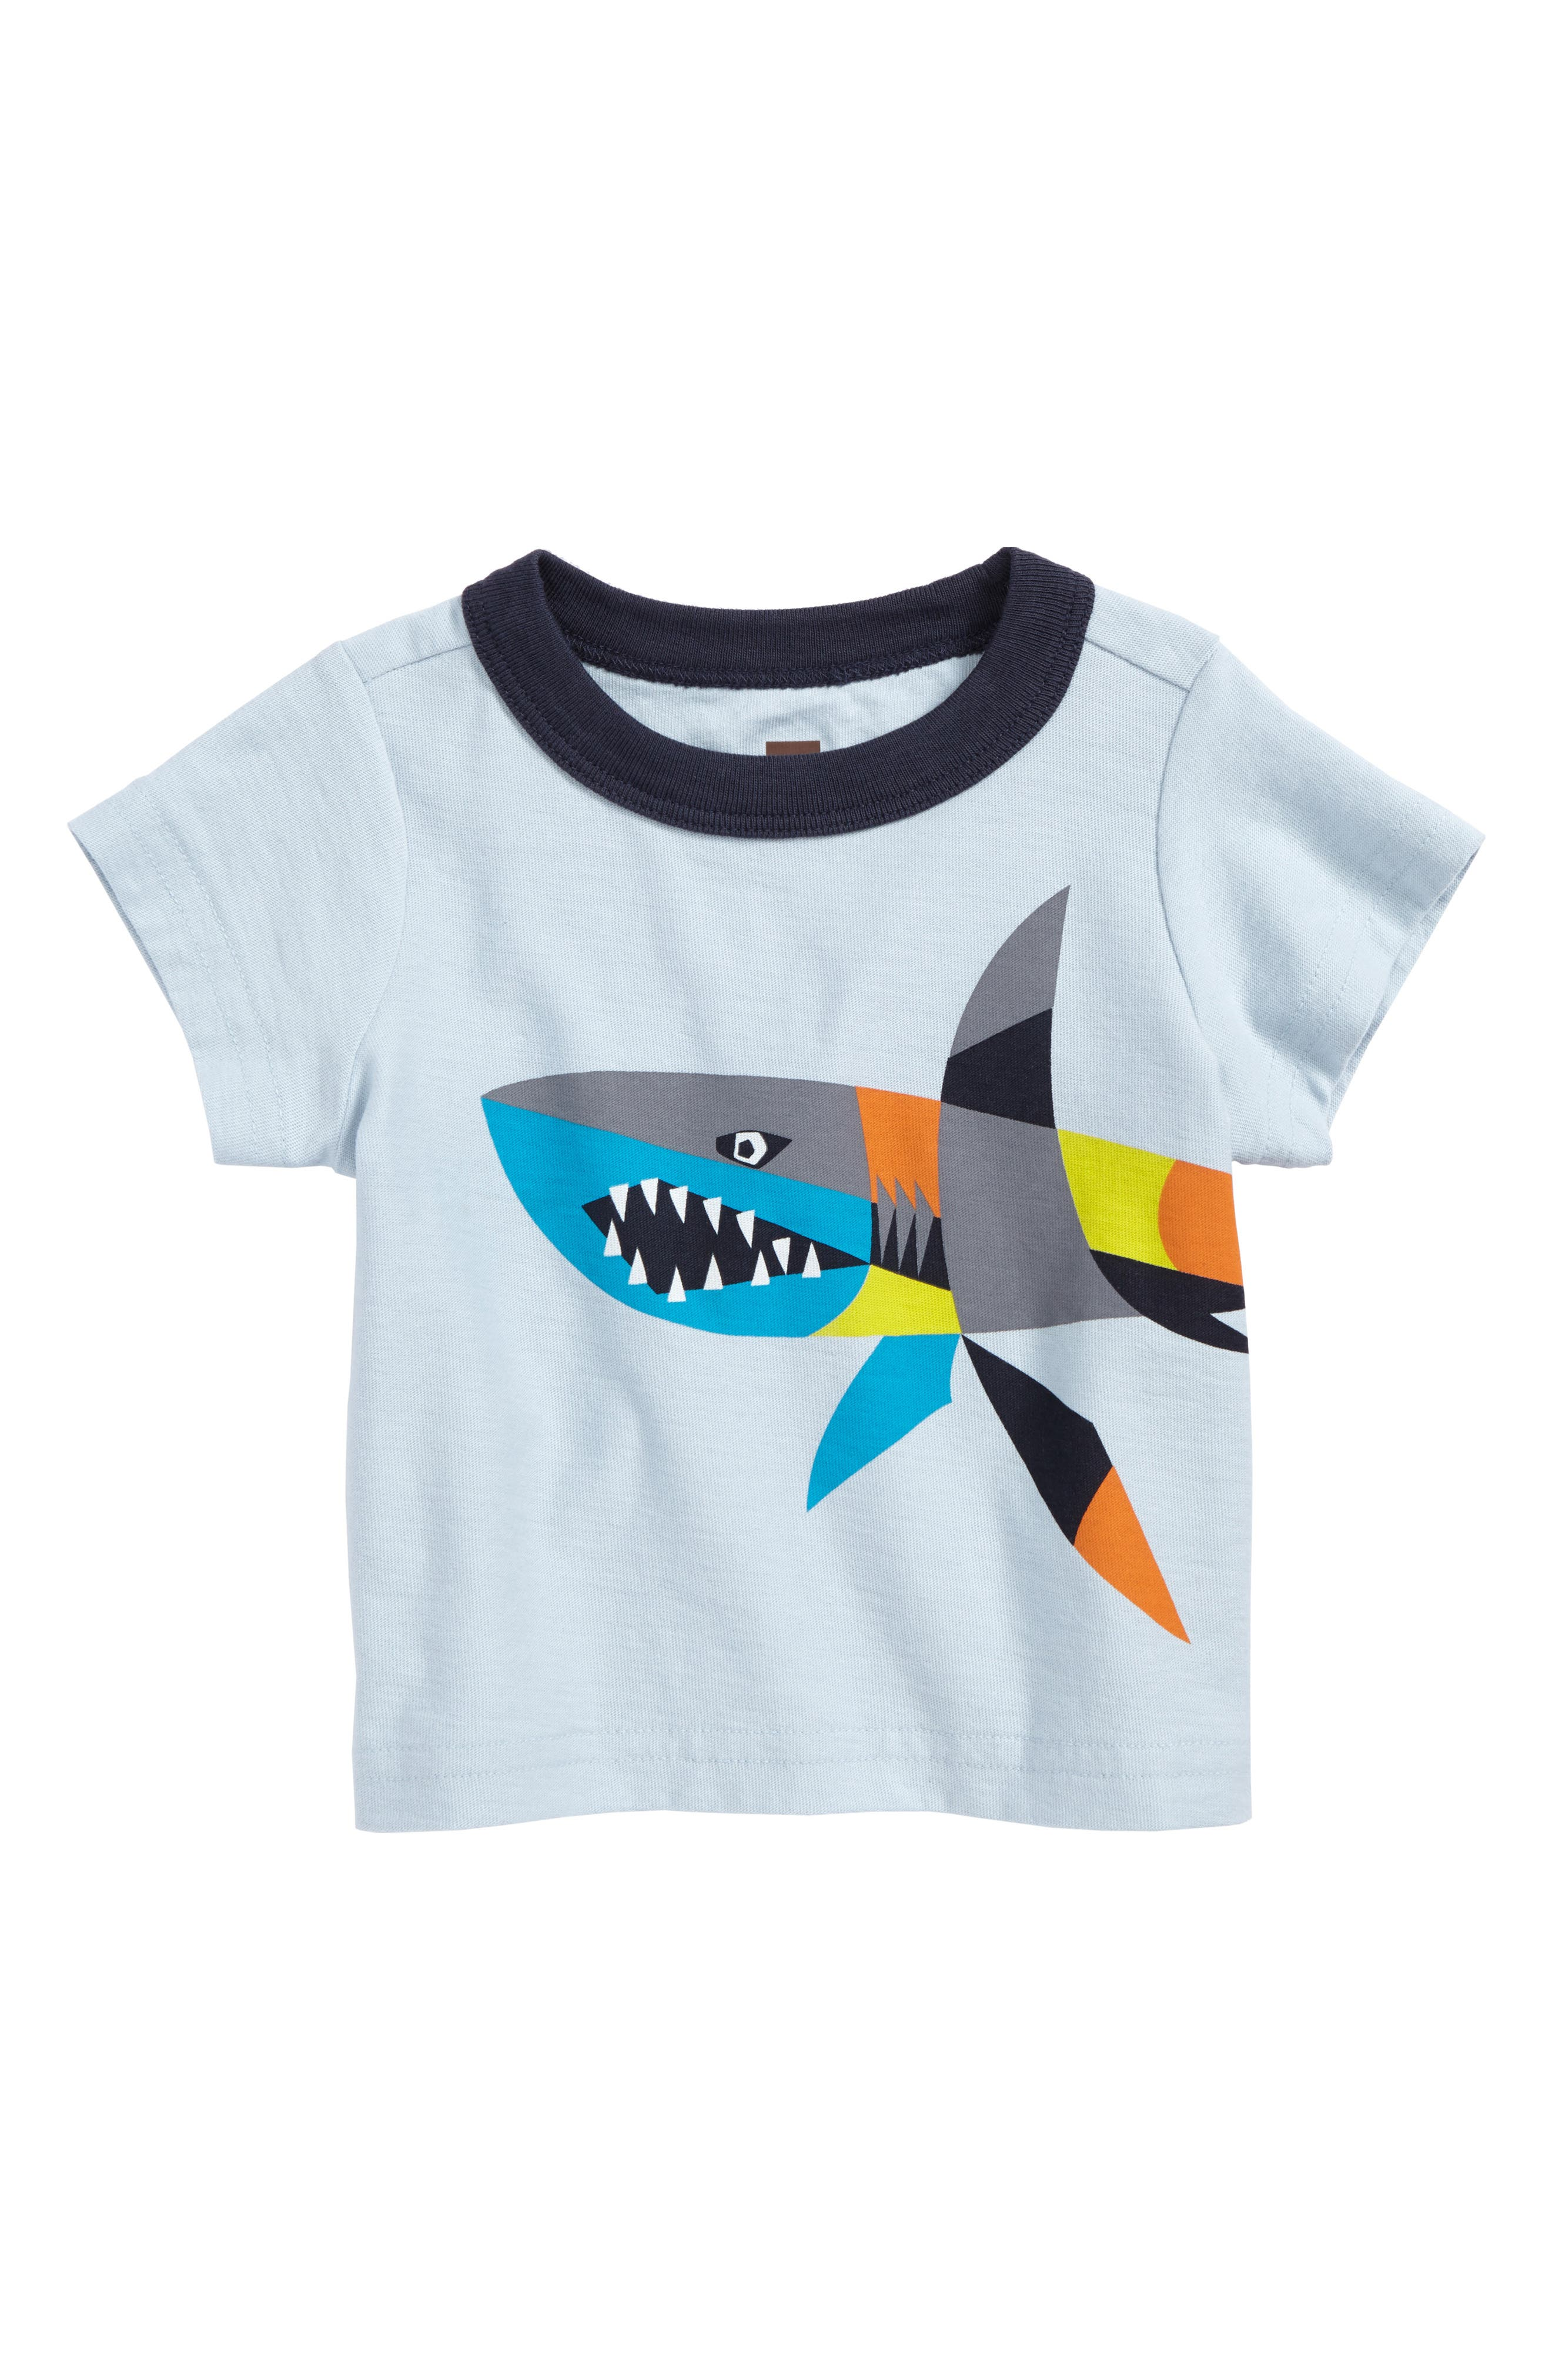 Chomper T-Shirt,                             Main thumbnail 1, color,                             020